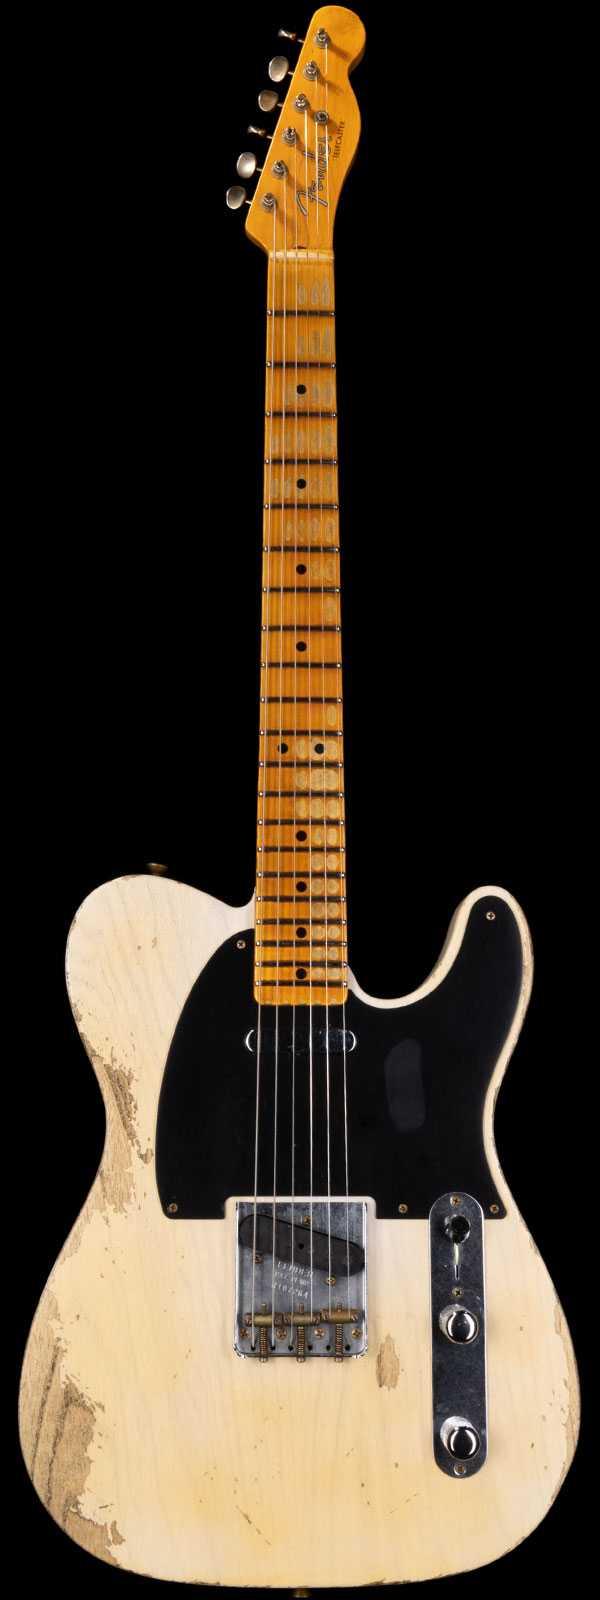 Fender Custom Shop 1952 Telecaster Heavy Relic Streamlined U Neck White Blonde